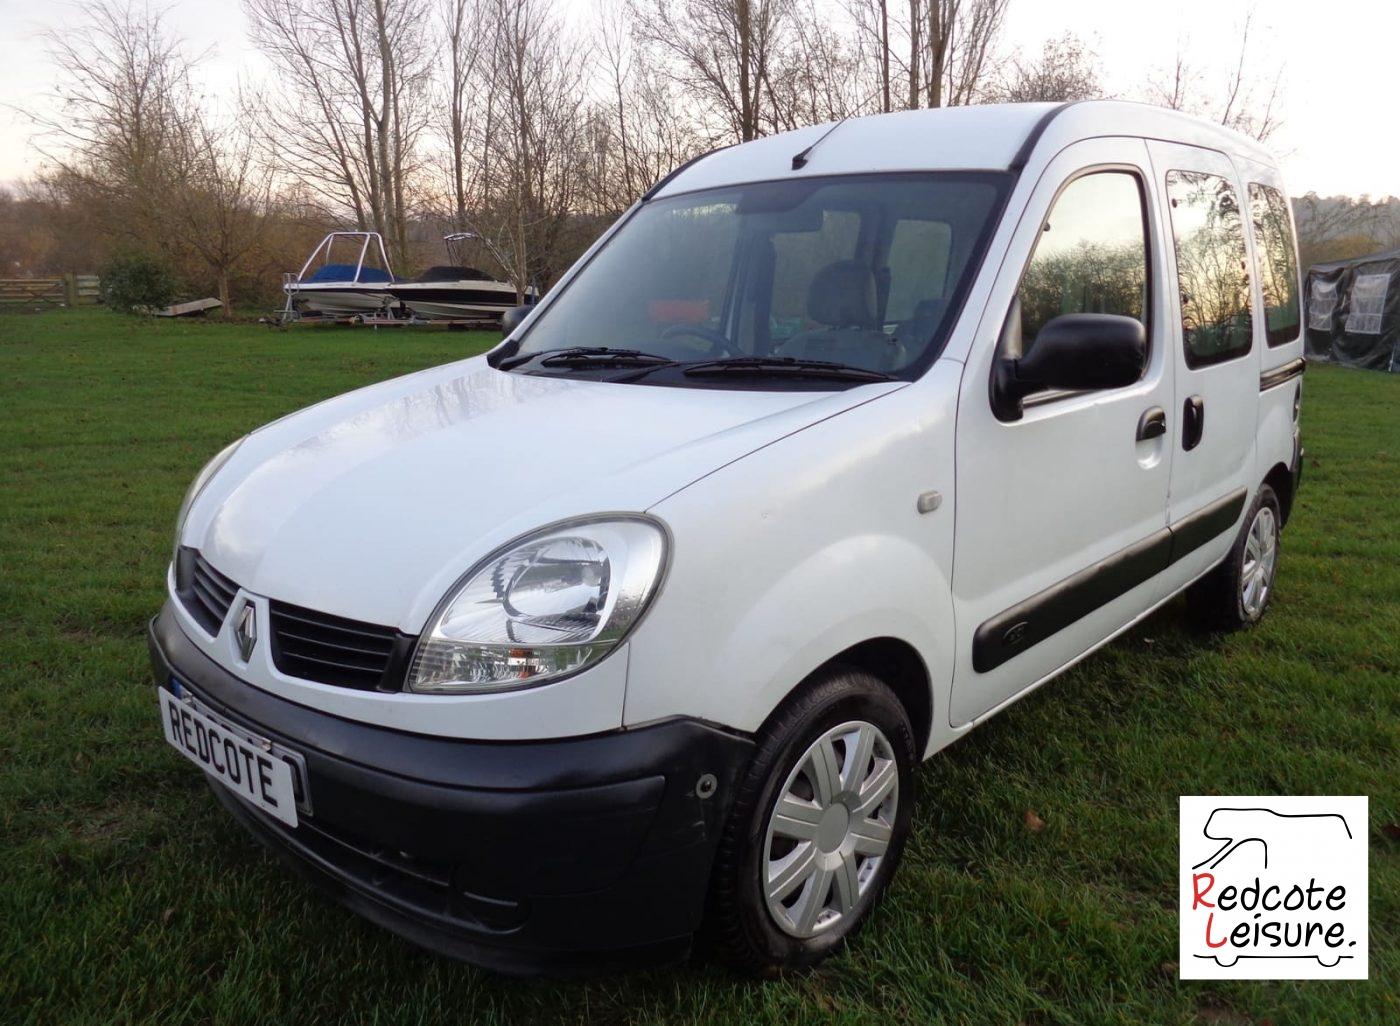 2006 Renault Kangoo AUTHENTIQUE DCI Micro Camper (1)